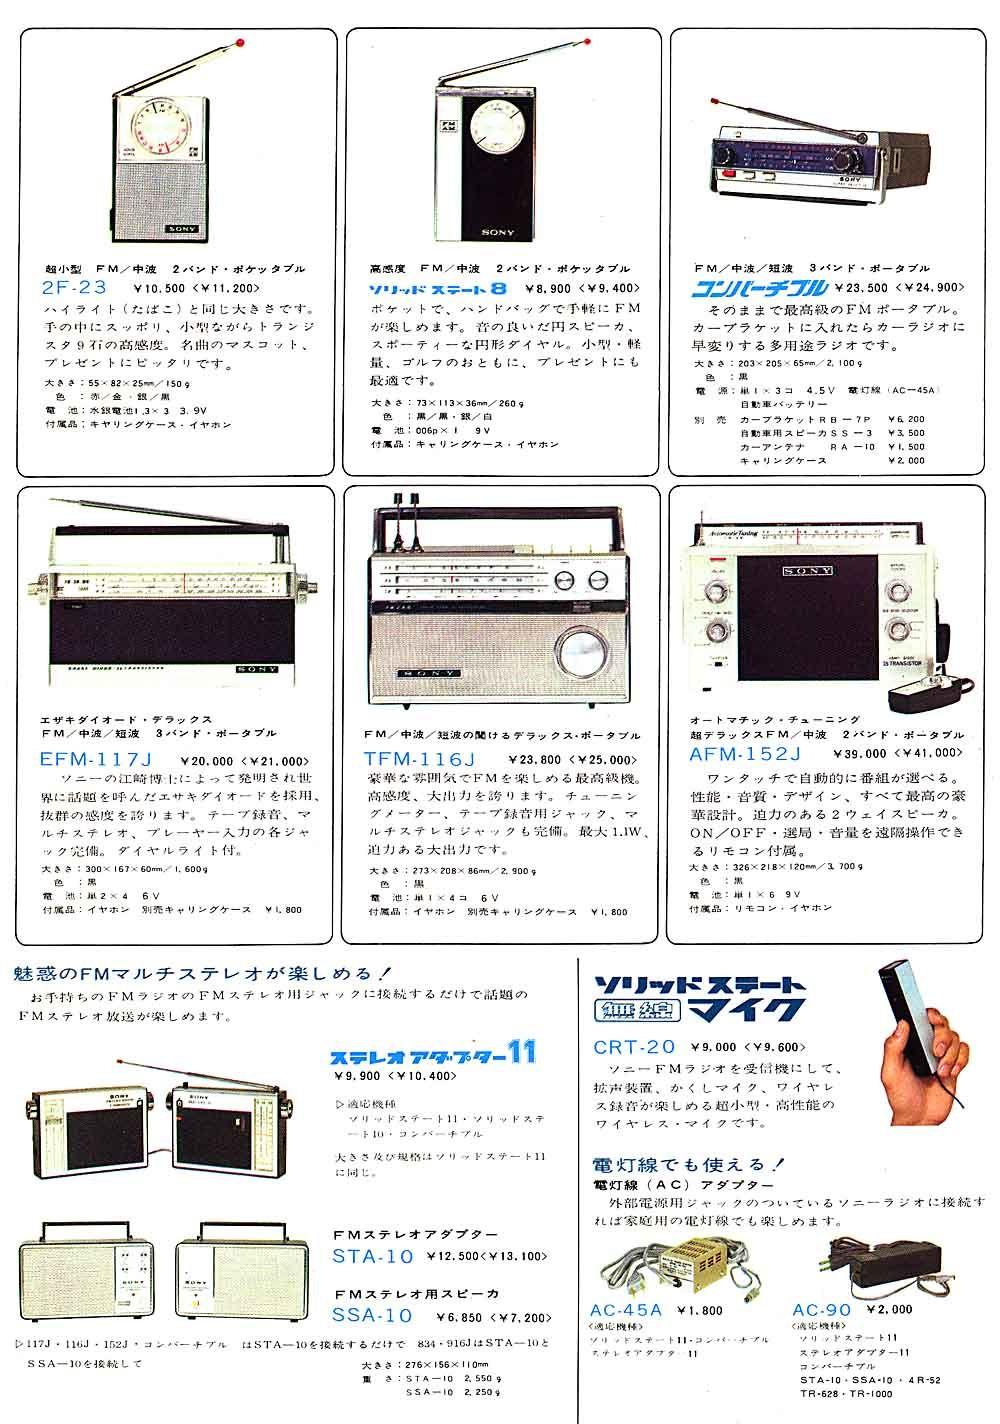 Transistorradio 1965 광고